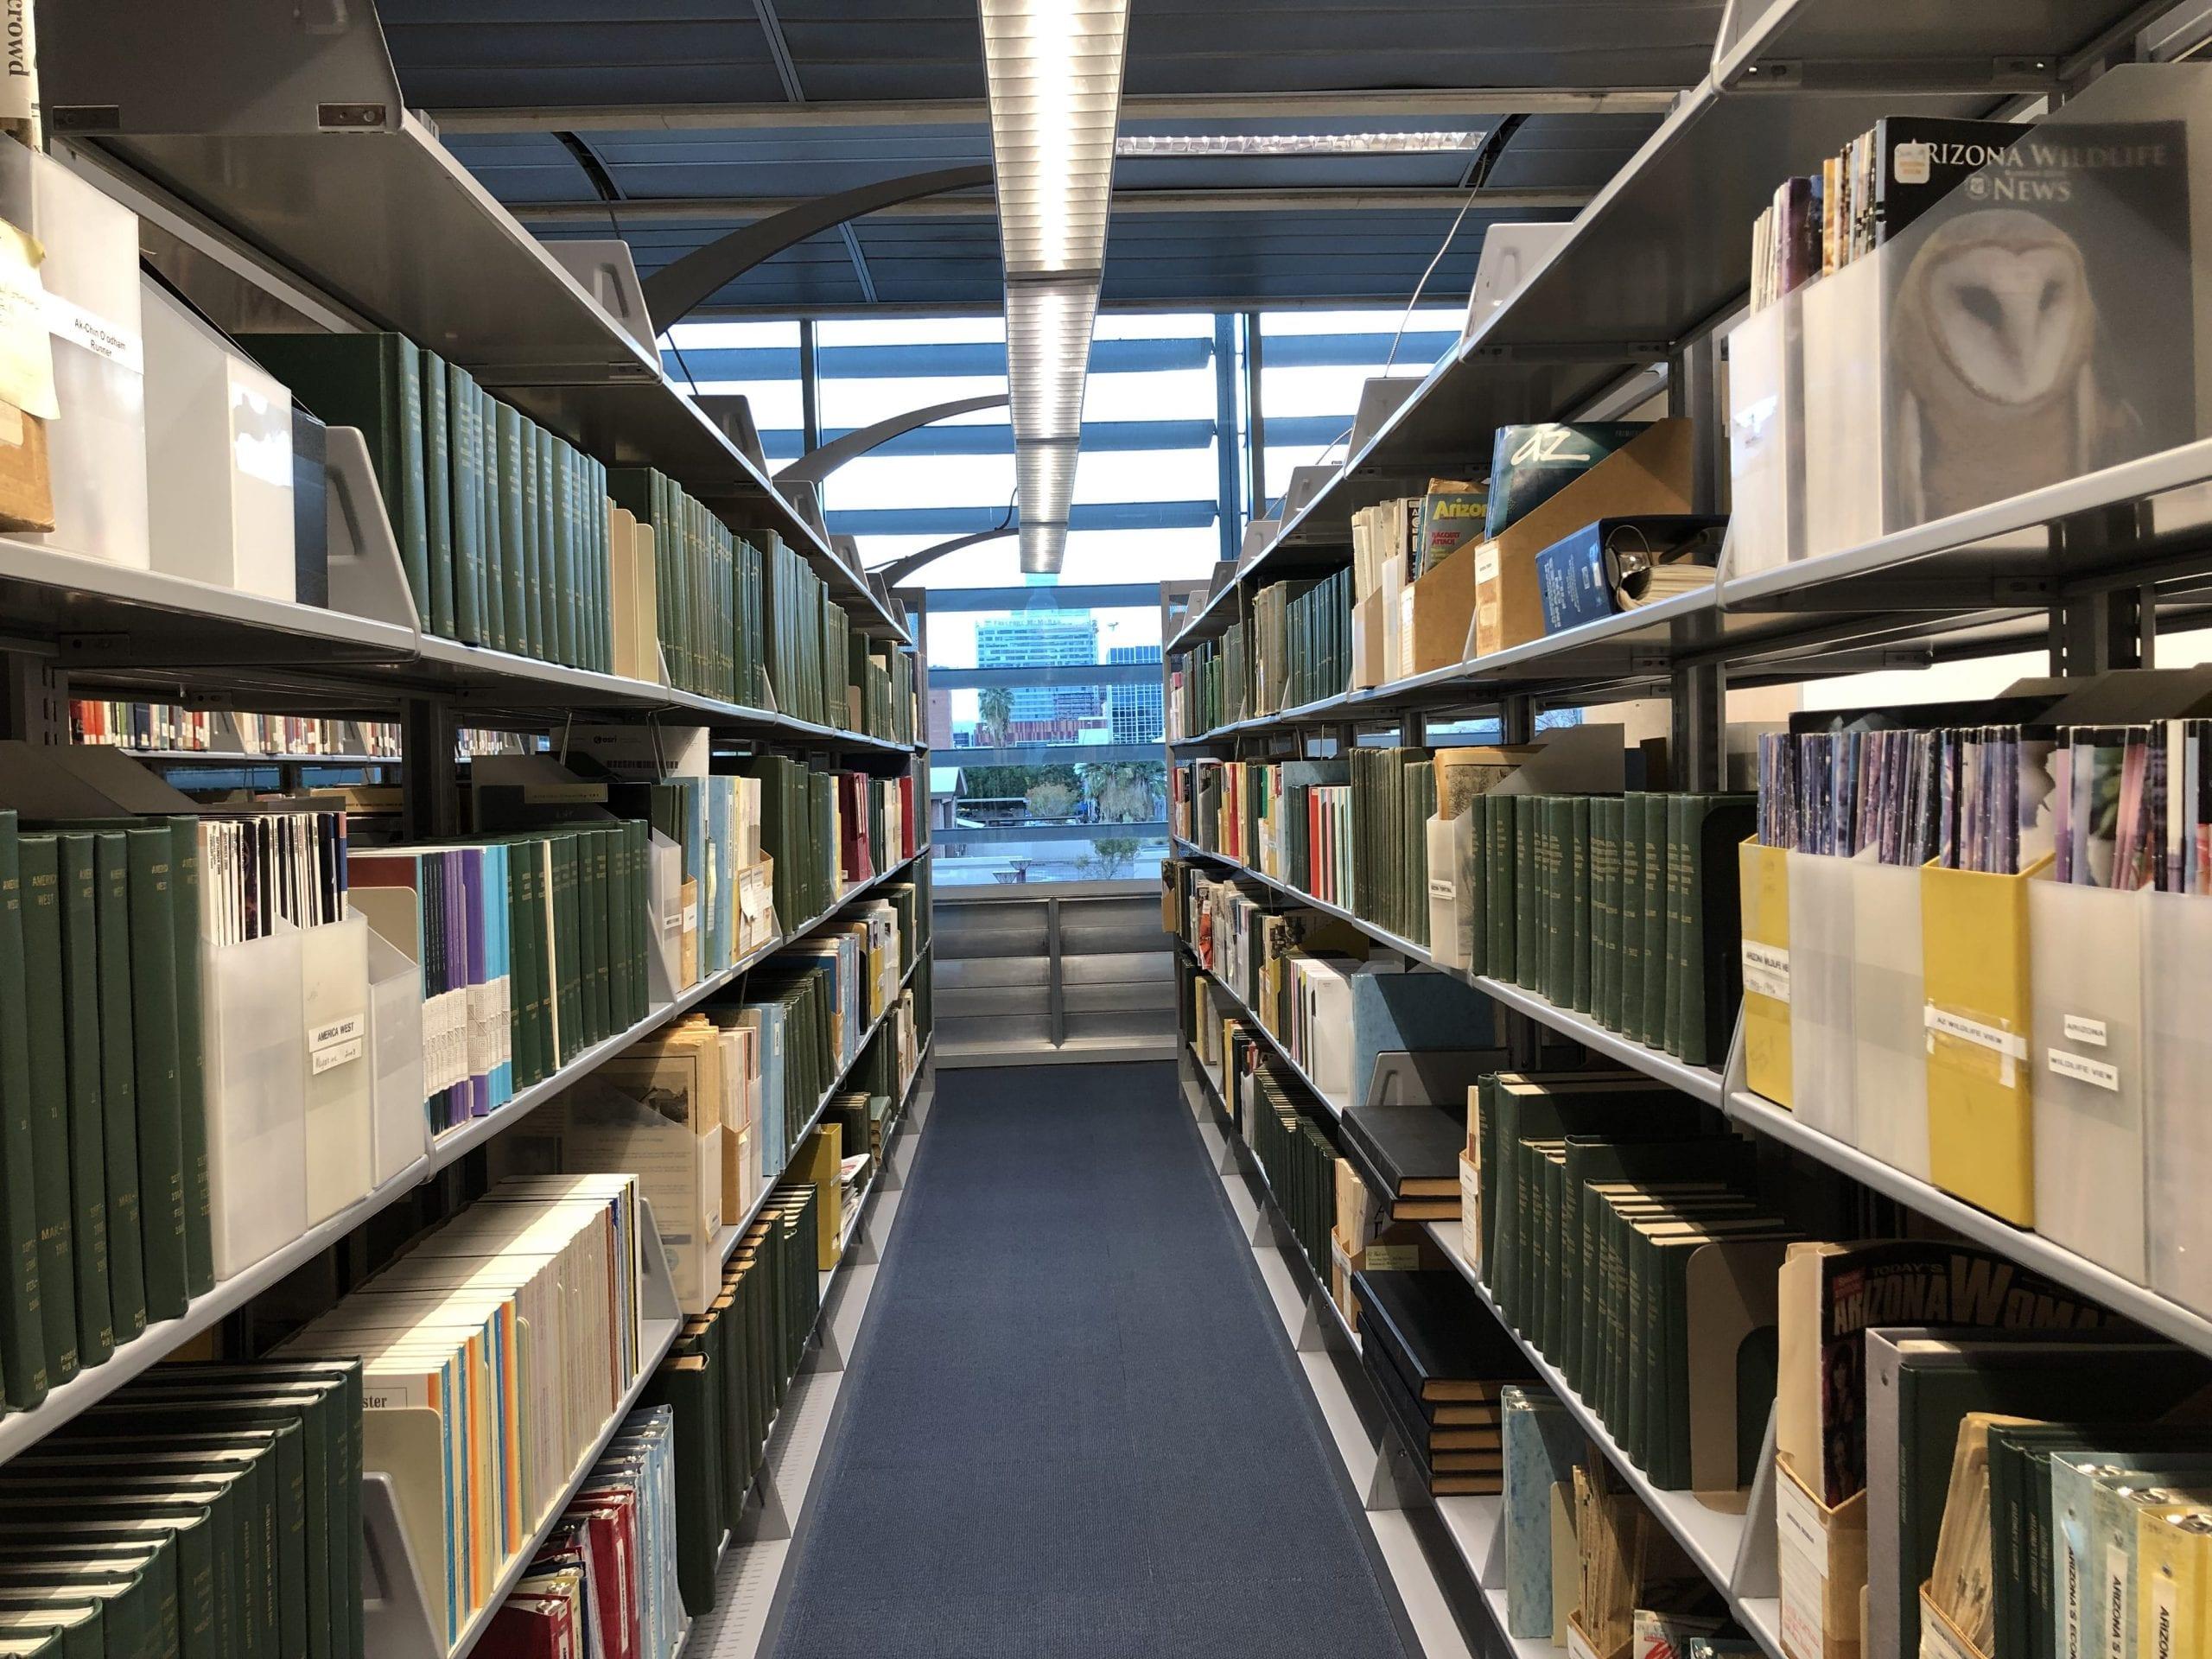 Burton Barr books interior